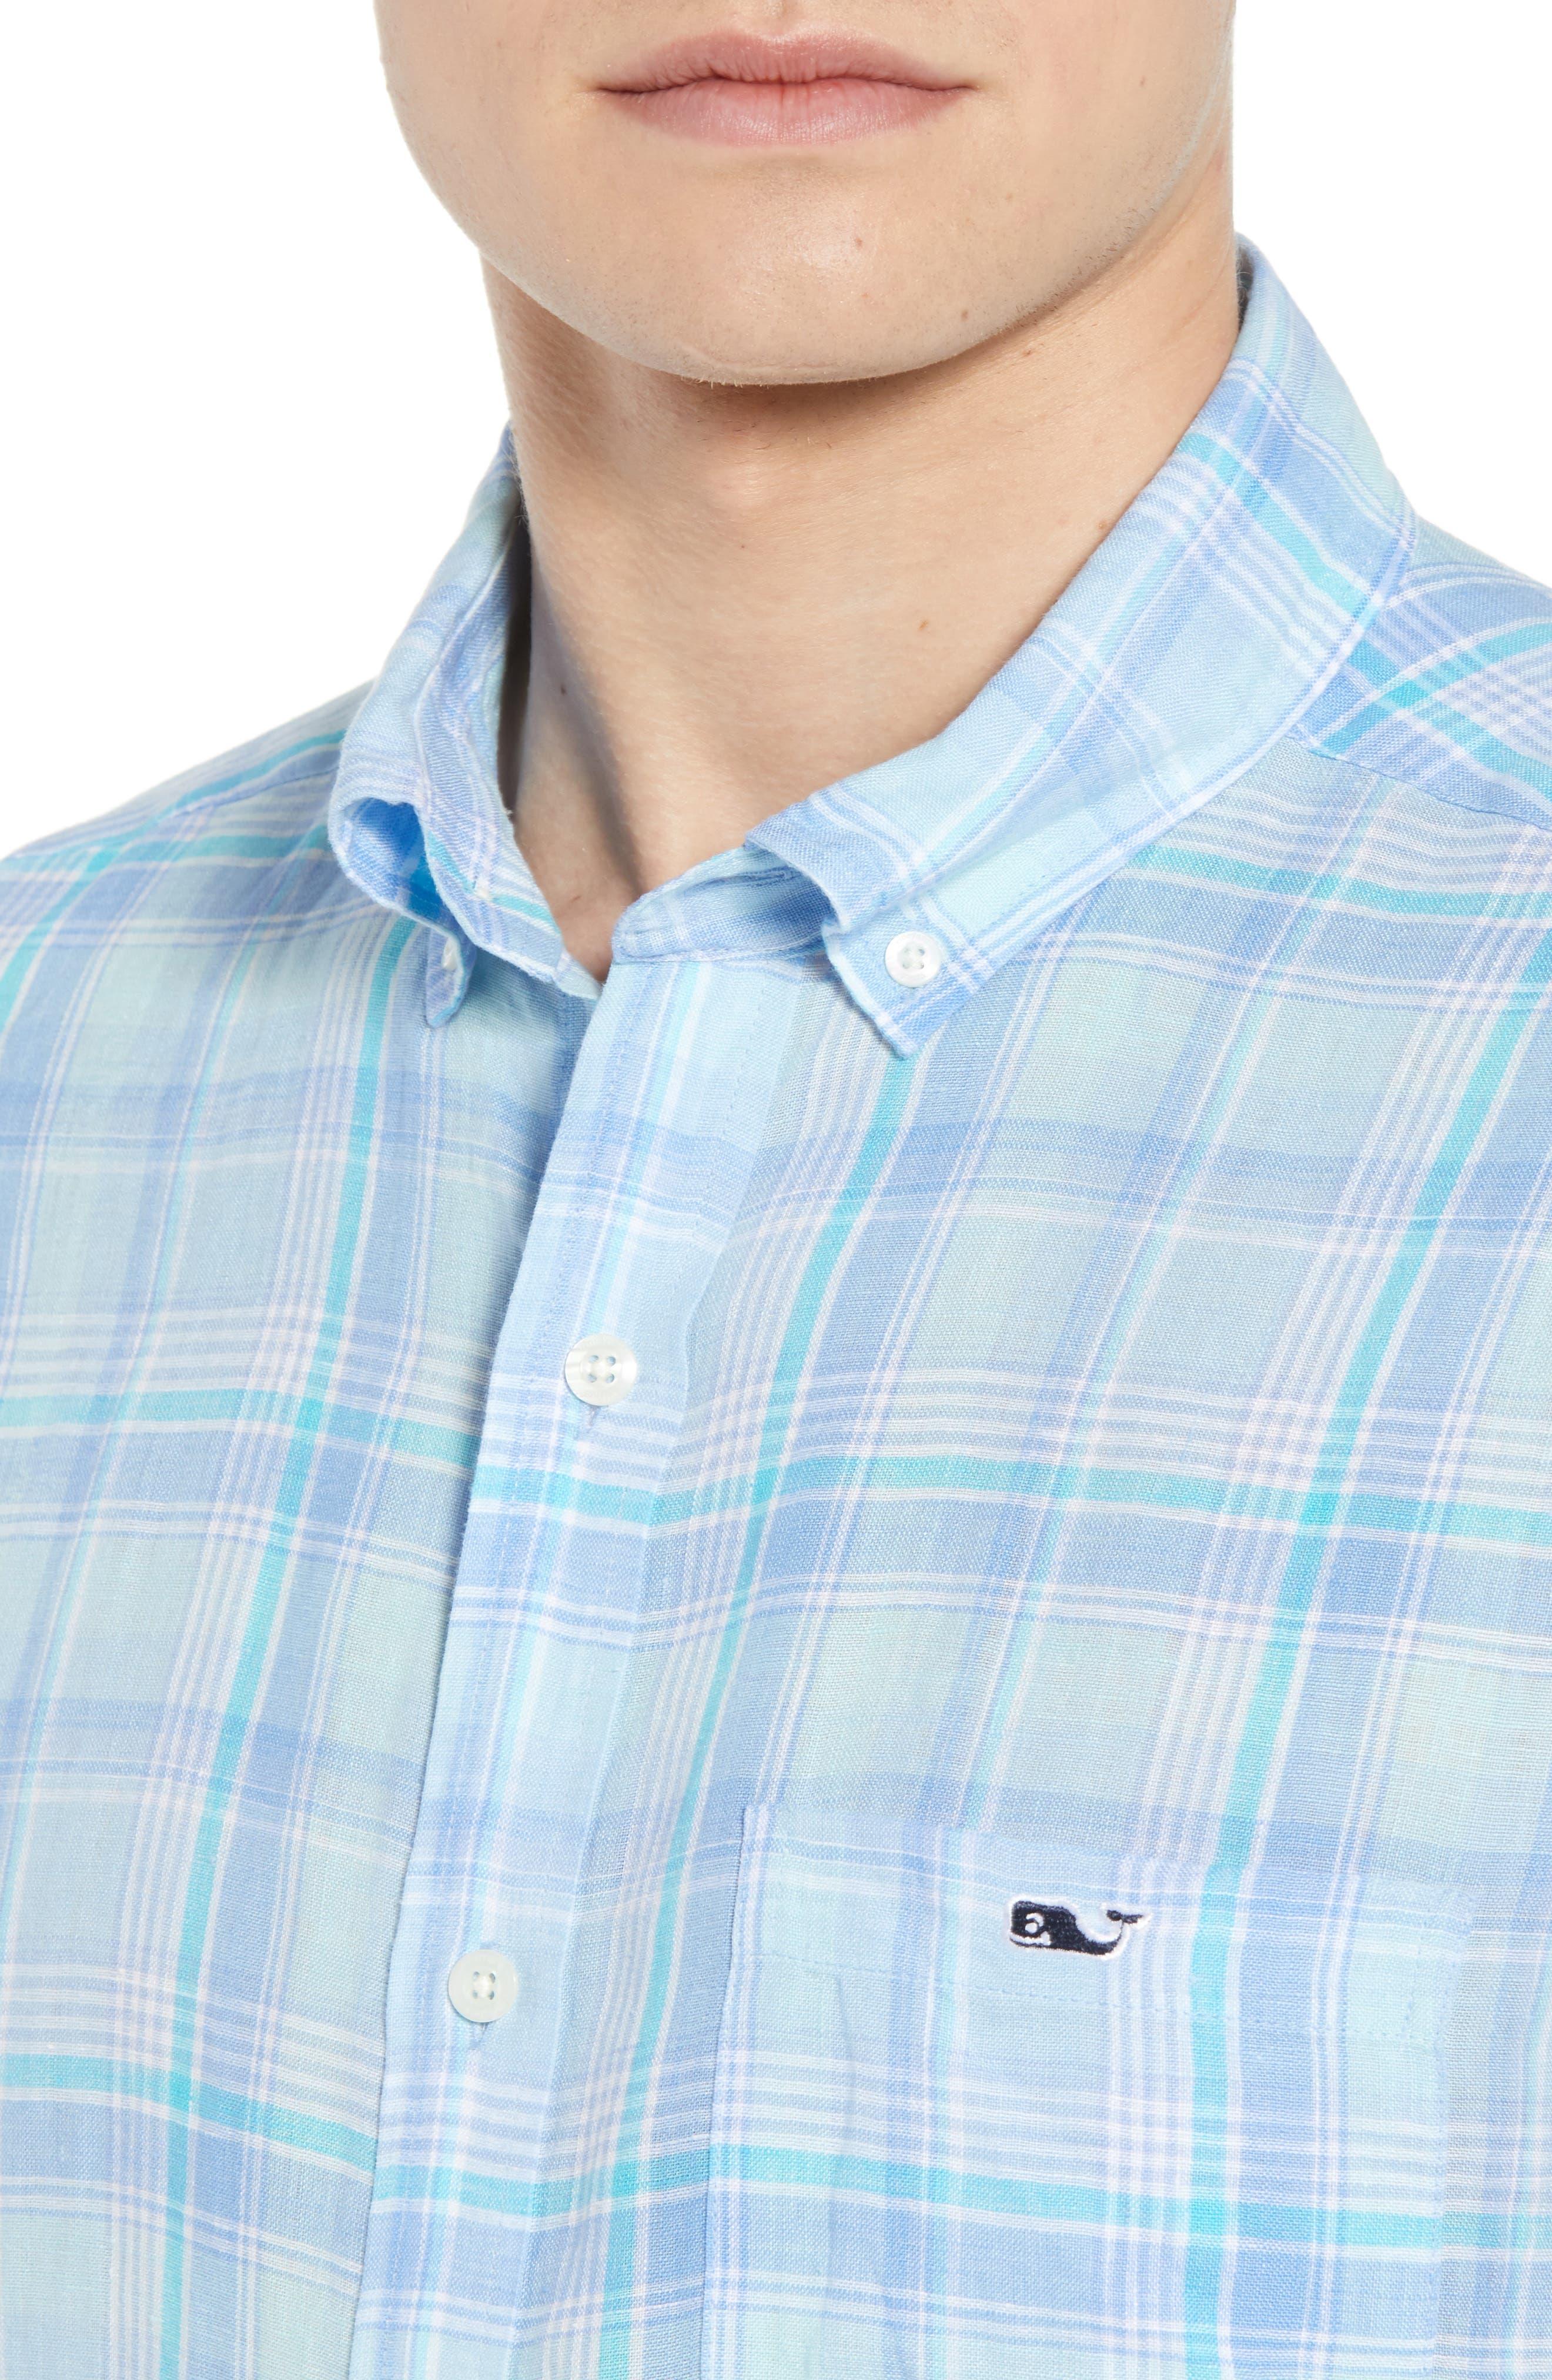 Moore's Island Classic Fit Plaid Sport Shirt,                             Alternate thumbnail 4, color,                             400